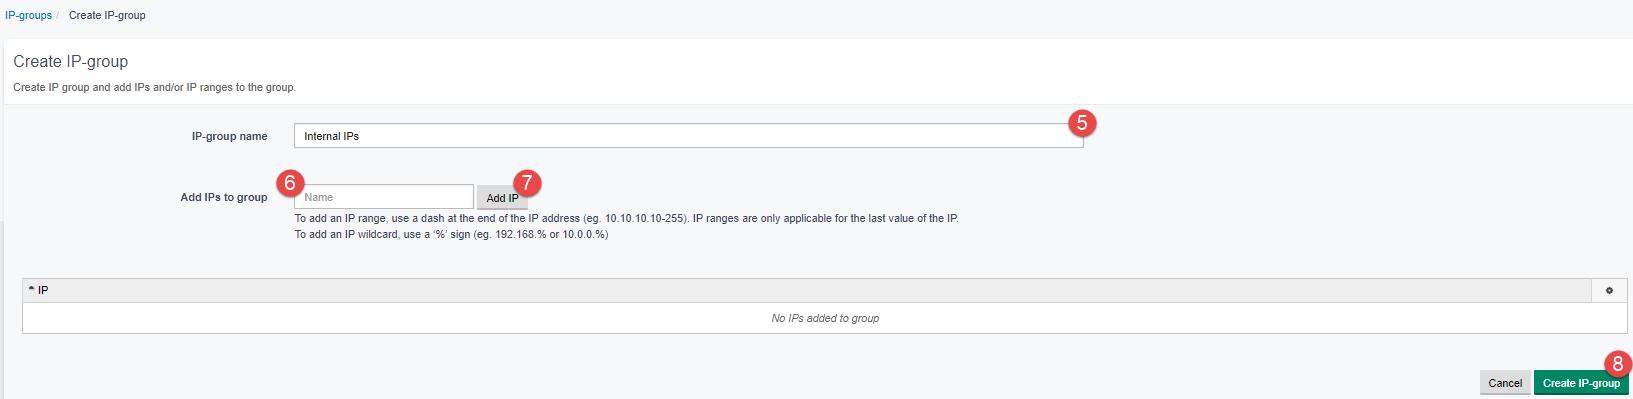 Create IP group